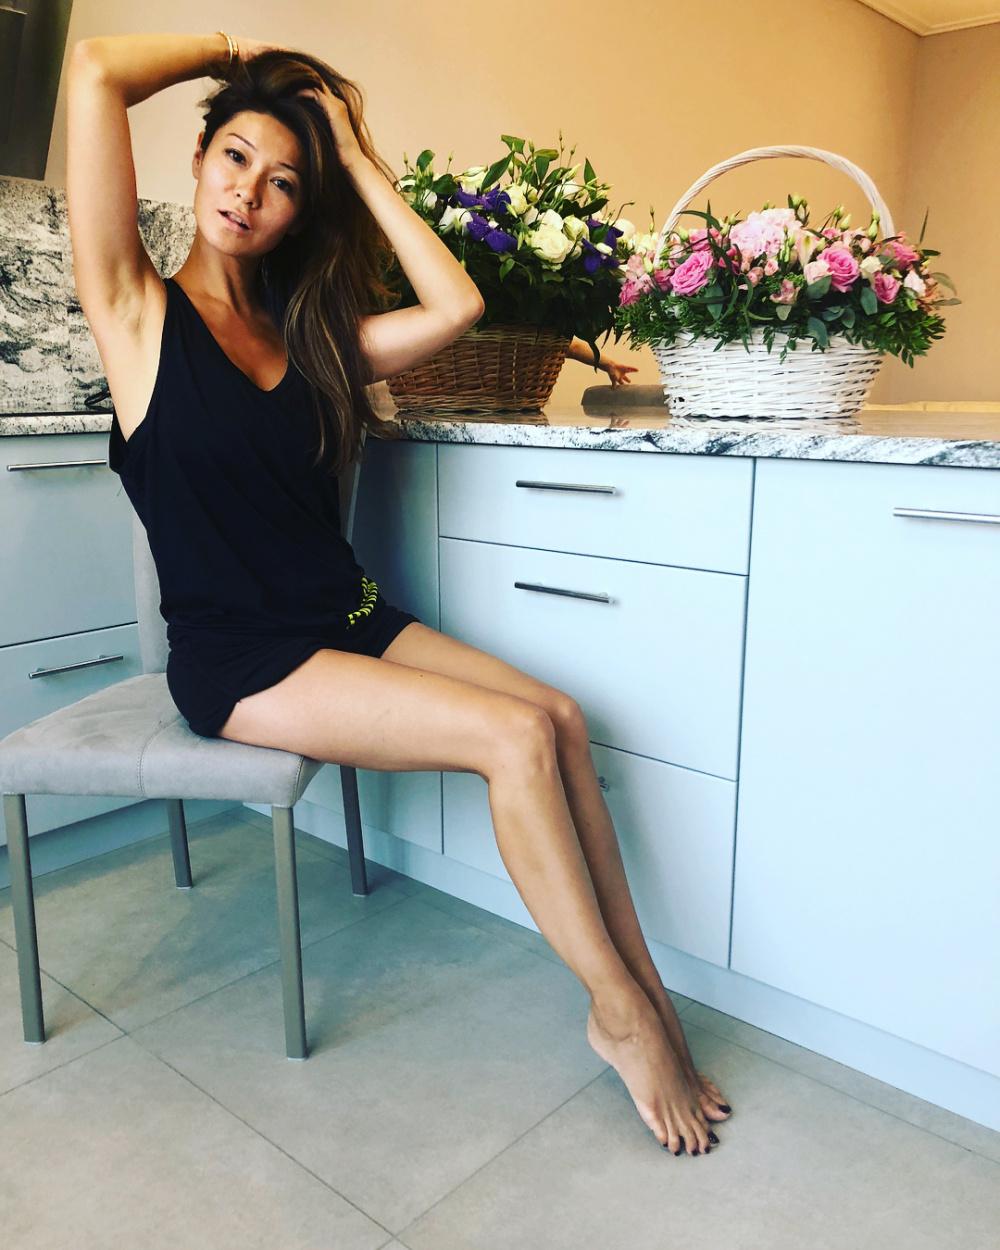 Марина ким инстаграм фото